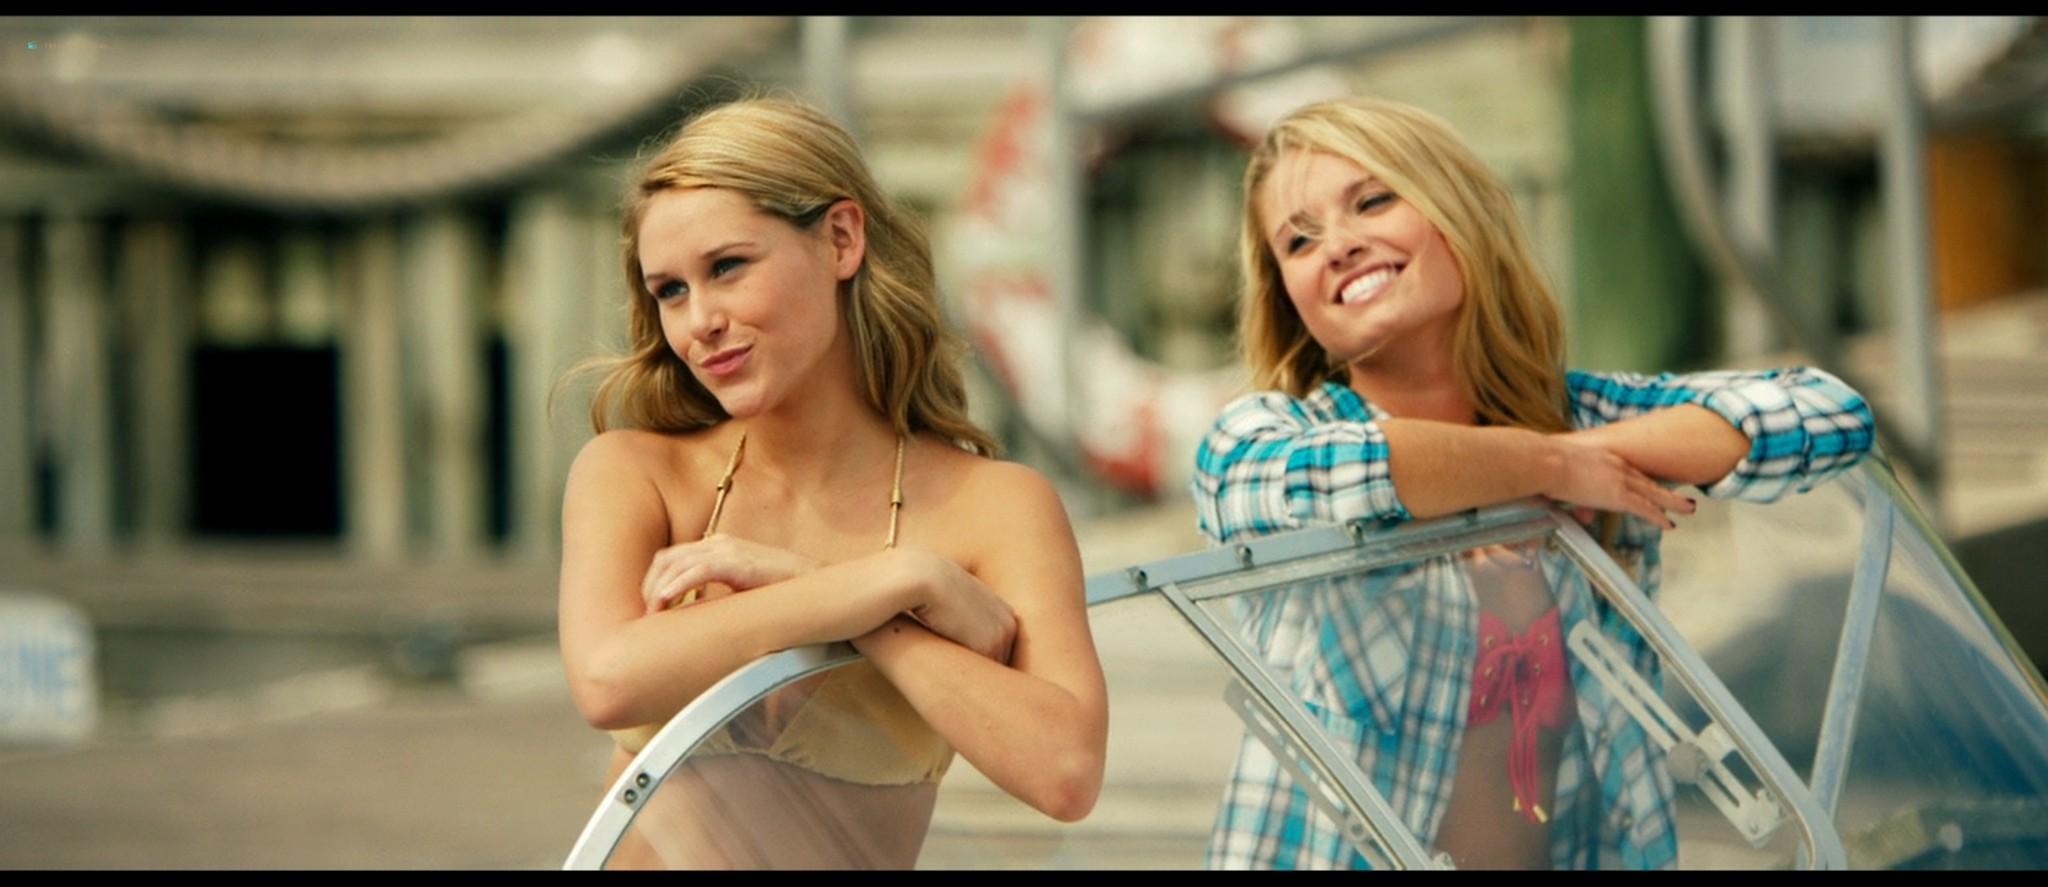 Teresa Palmer hot bikini and Maggie Grace, Alexandra Daddario hot too - The Choice (2016) HD 1080p BluRay (20)